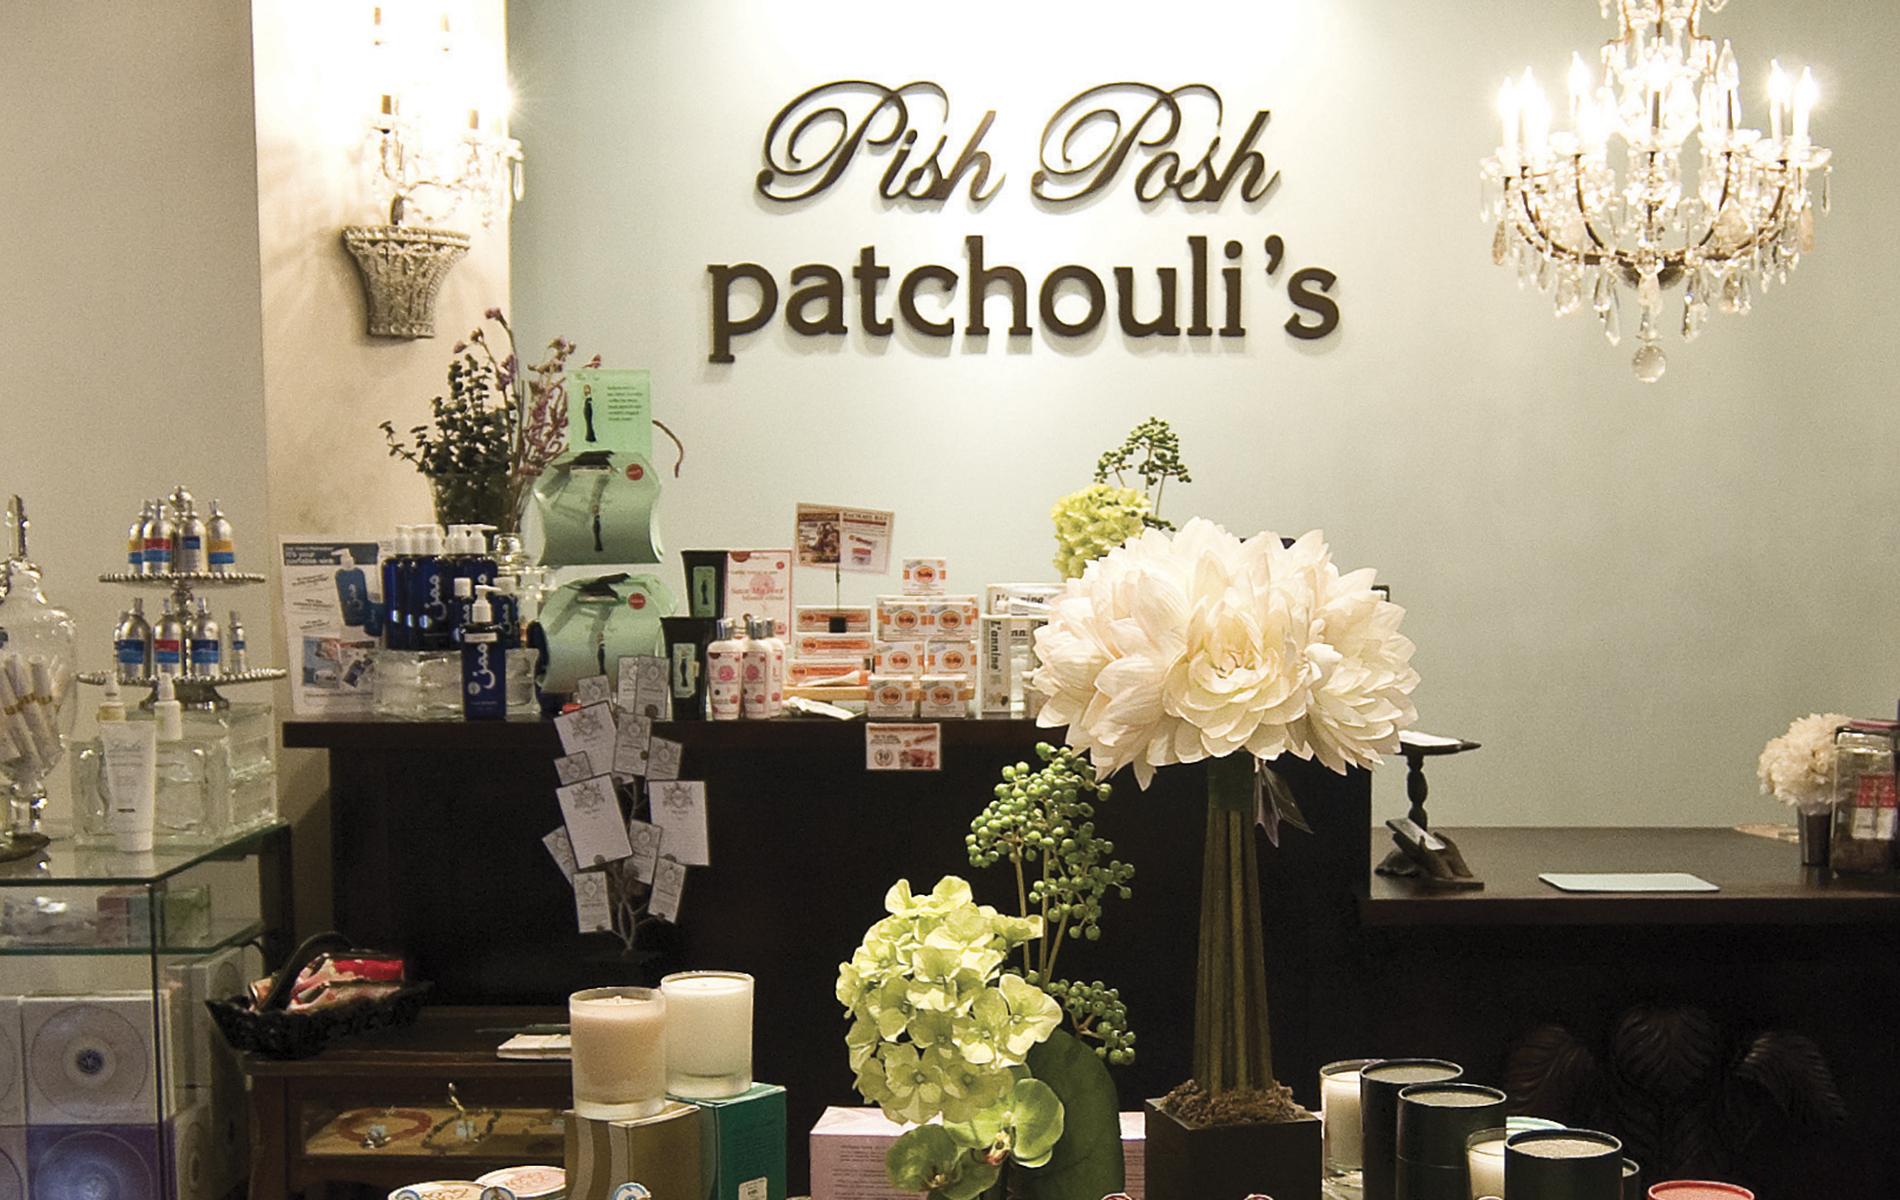 Pish Posh Patchouli's; desk